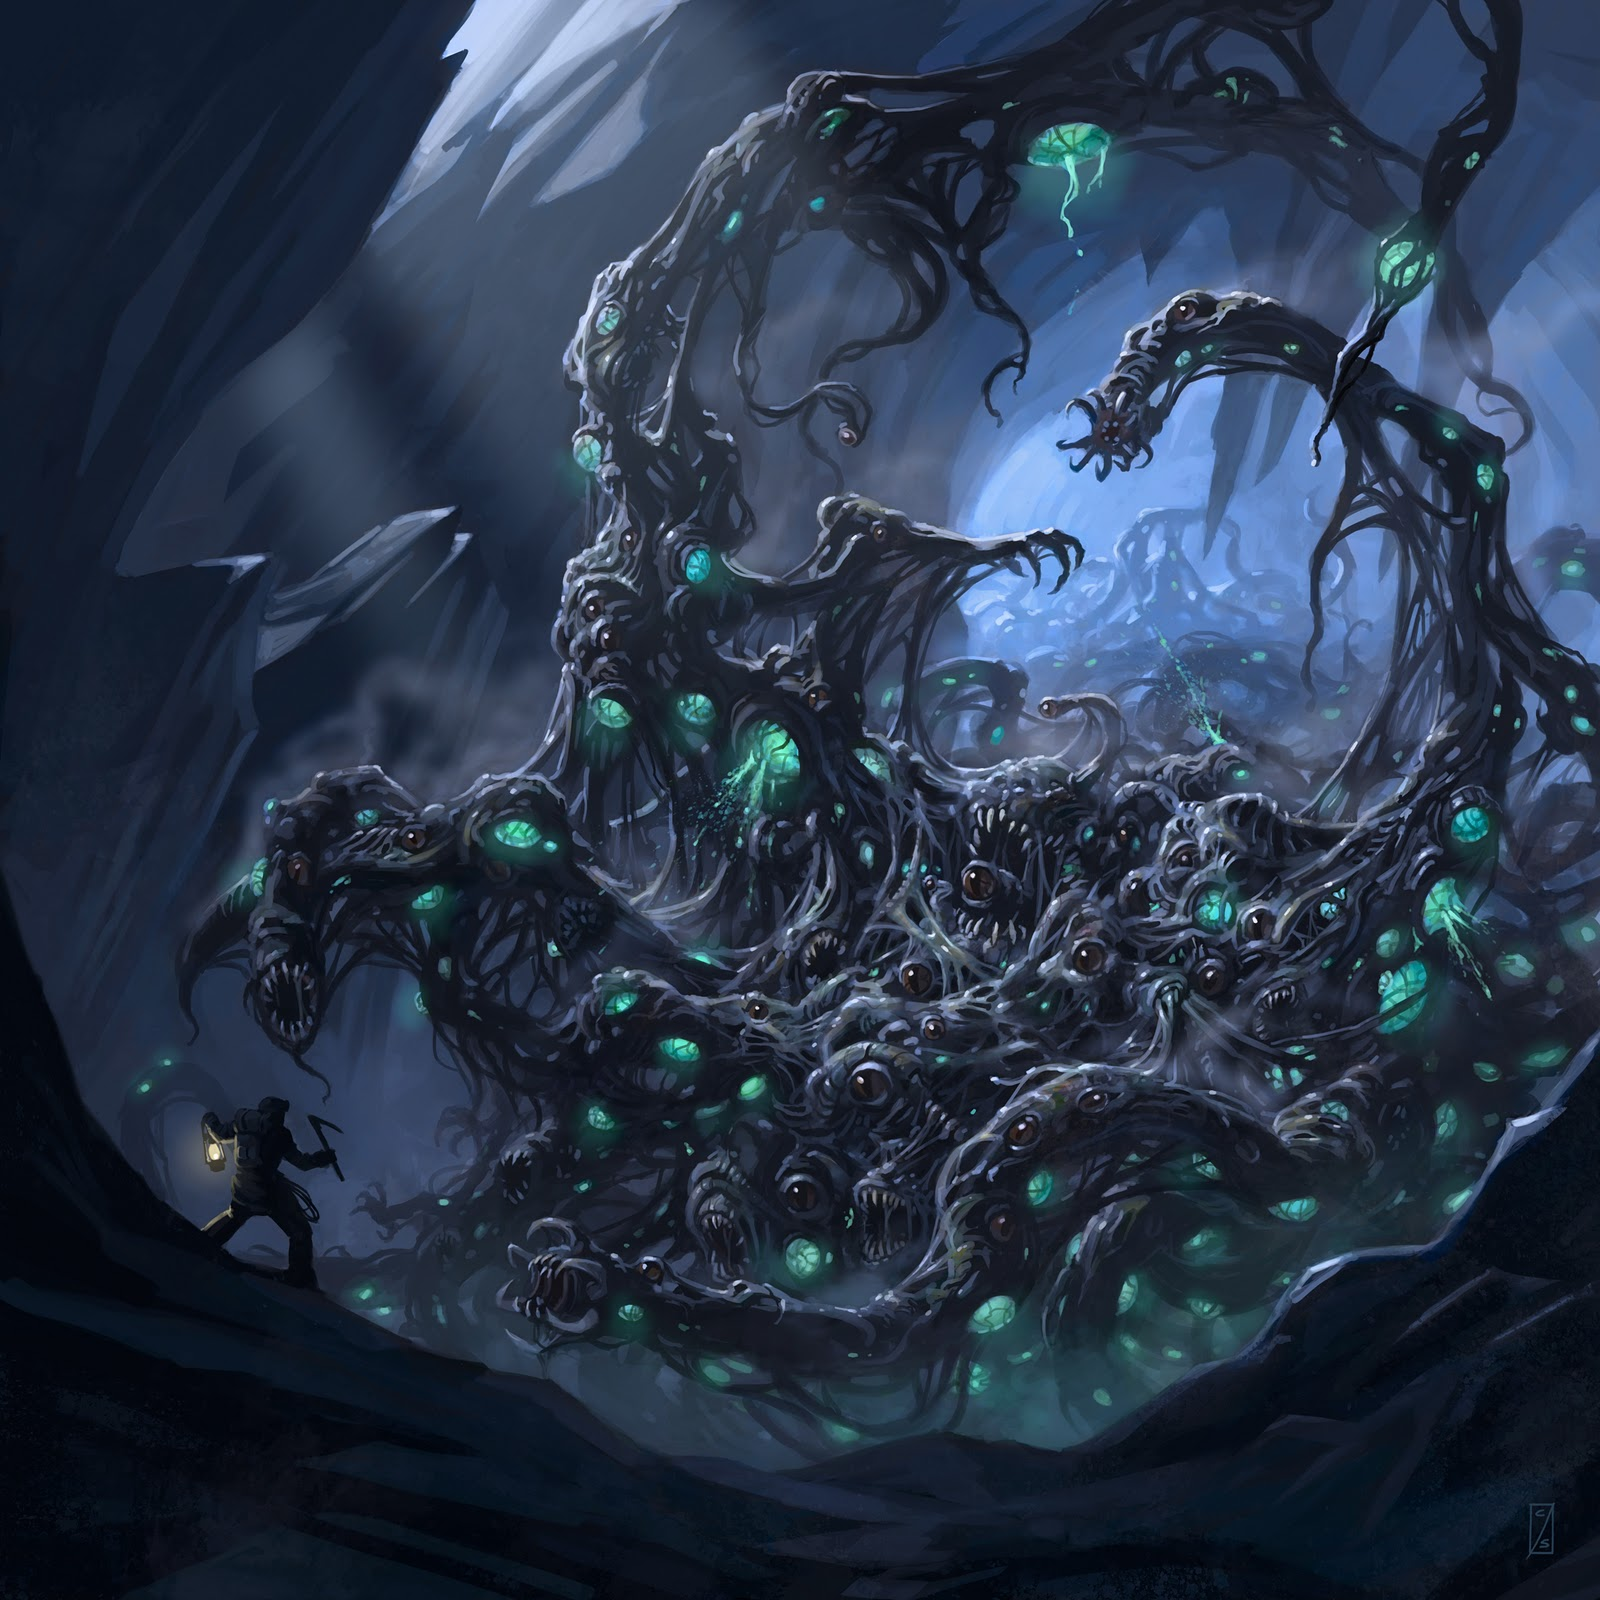 Nismo Stuff Cool H P Lovecraft Art